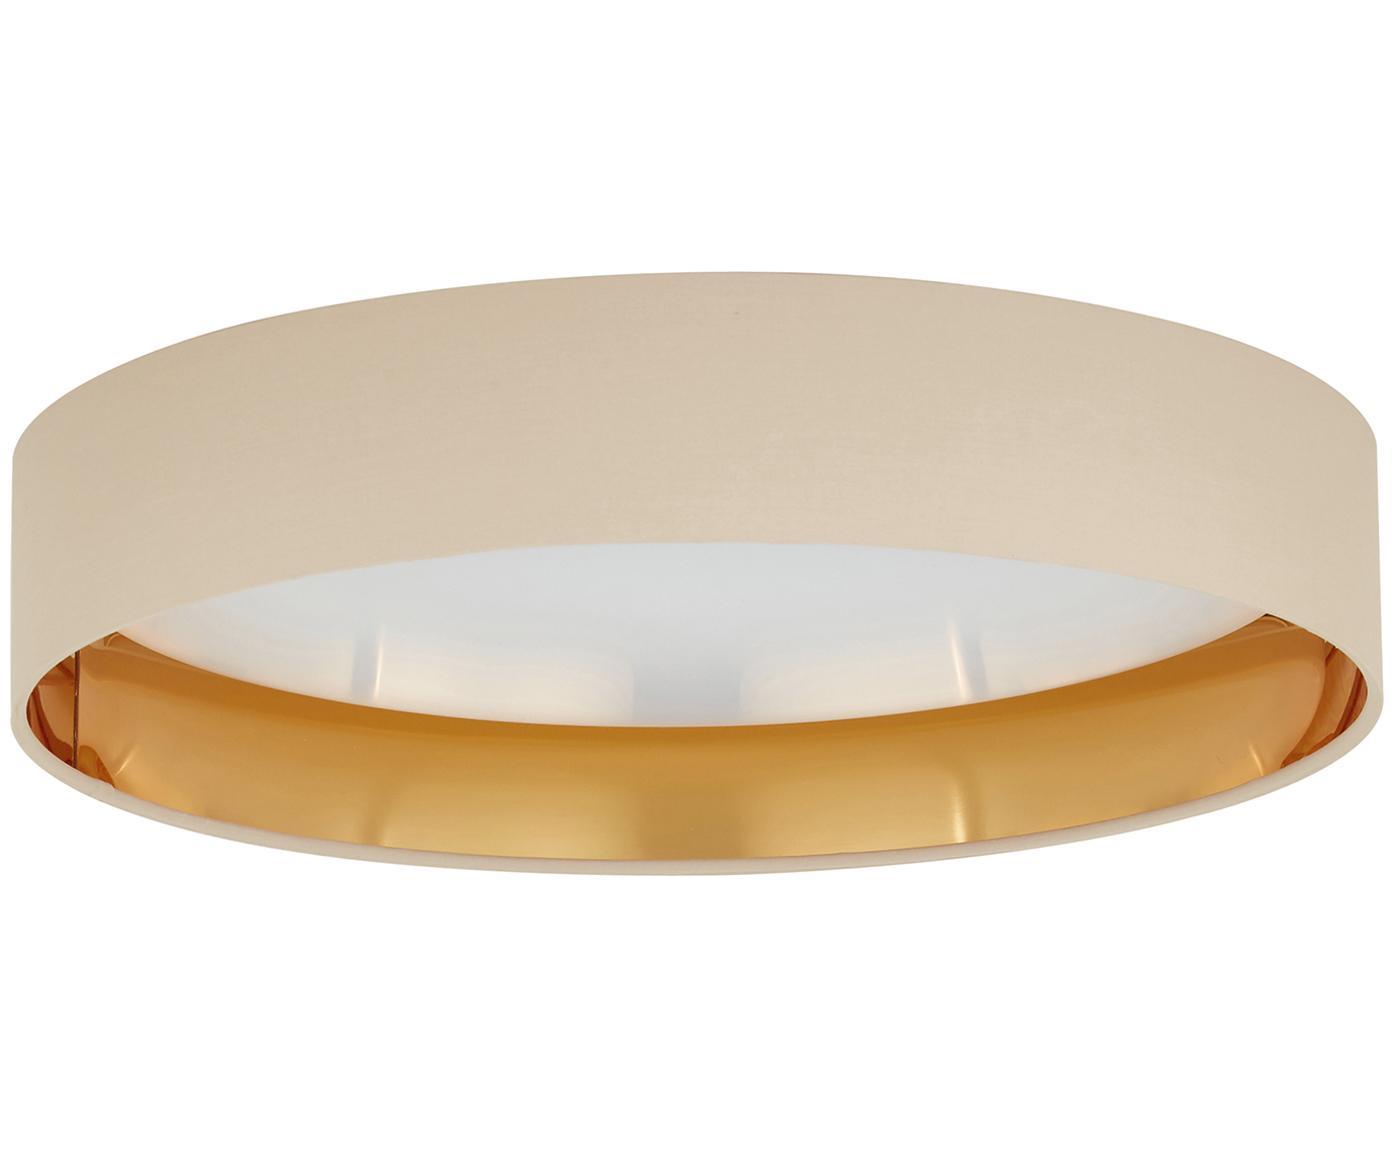 LED plafondlamp Mallory, Frame: metaal, Diffuser: kunststof, Taupe, Ø 41 x H 10 cm